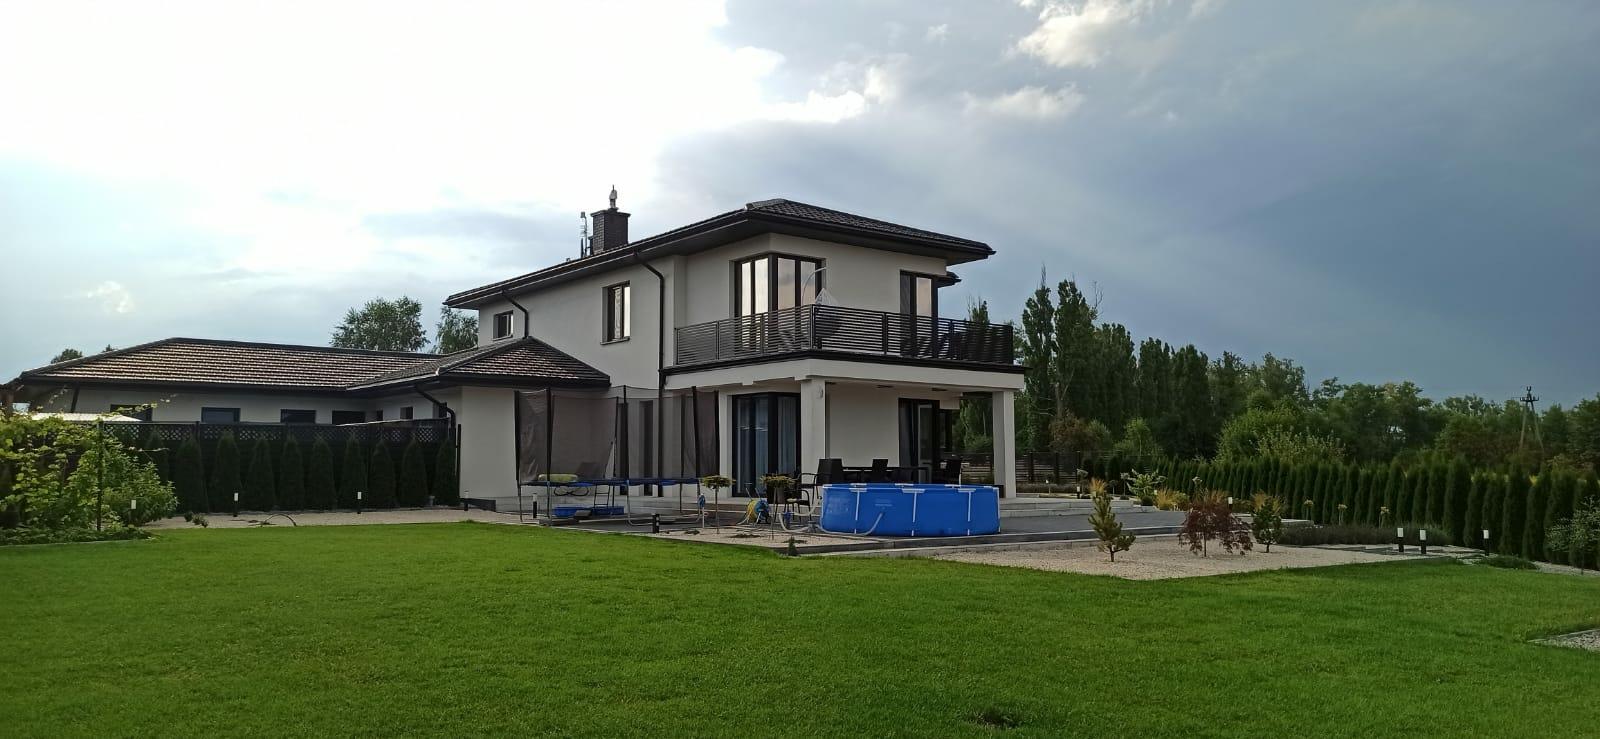 Folia M20 XT - górne piętro domu